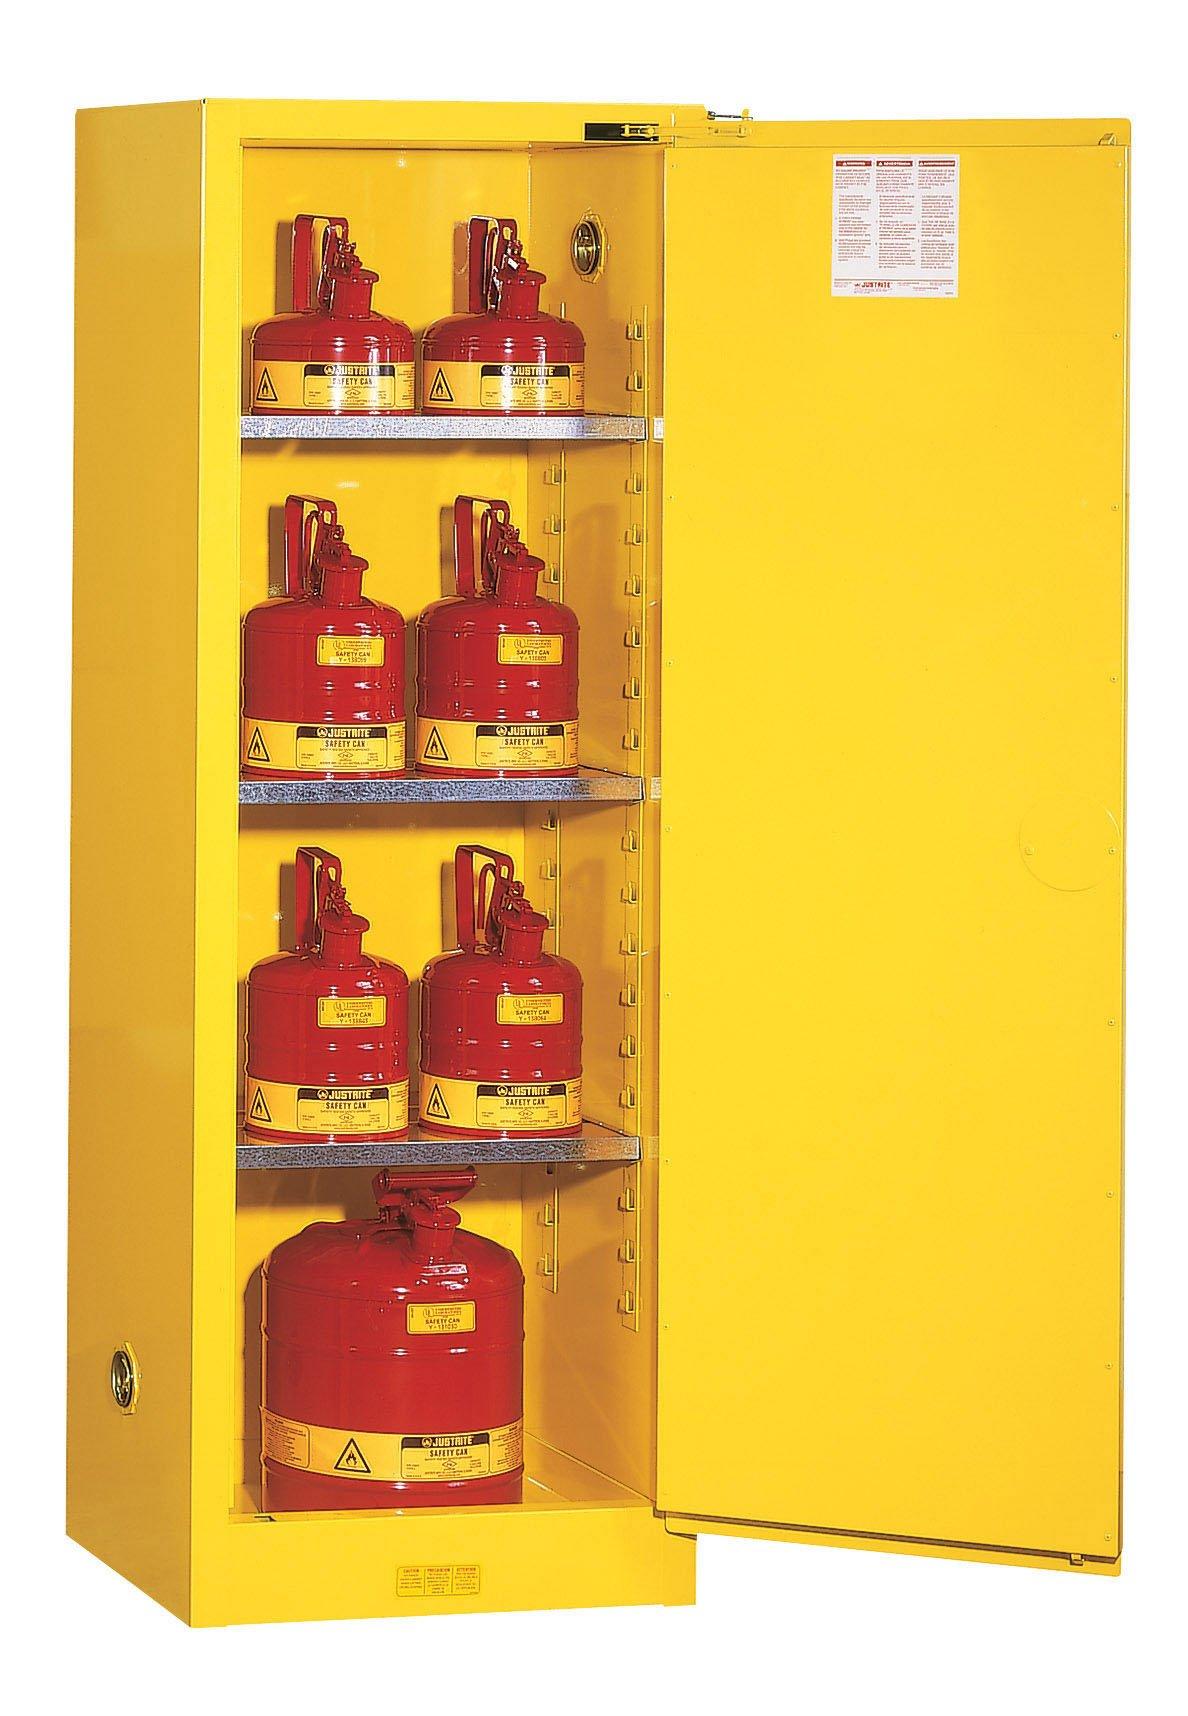 Justrite 890420 Sure-Grip EX 4 Gallon, 22'' H x 17'' W x 17'' D, 1 Door, 1 Shelf, Self-Close Yellow Countertop Flammable Storage Cabinet